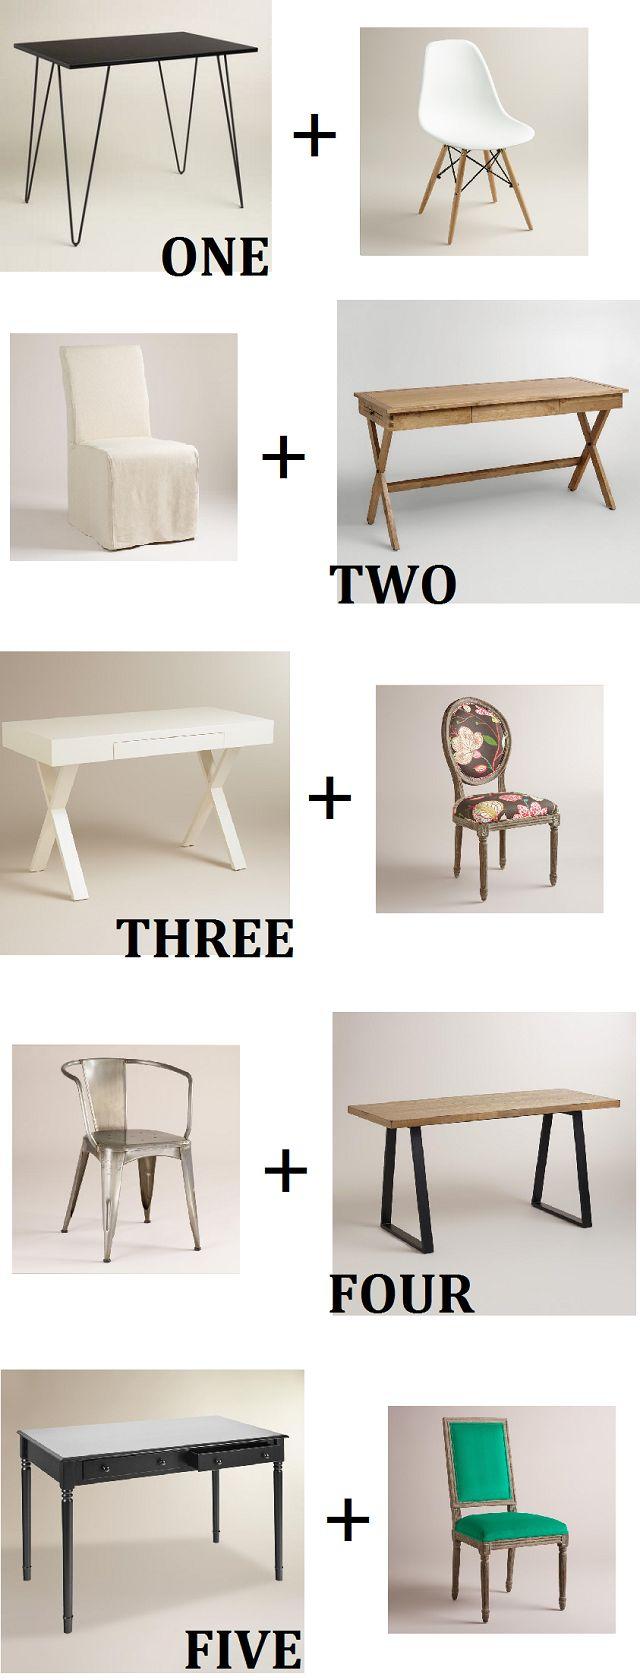 Best 25+ Small desks ideas on Pinterest   Small desk bedroom ...